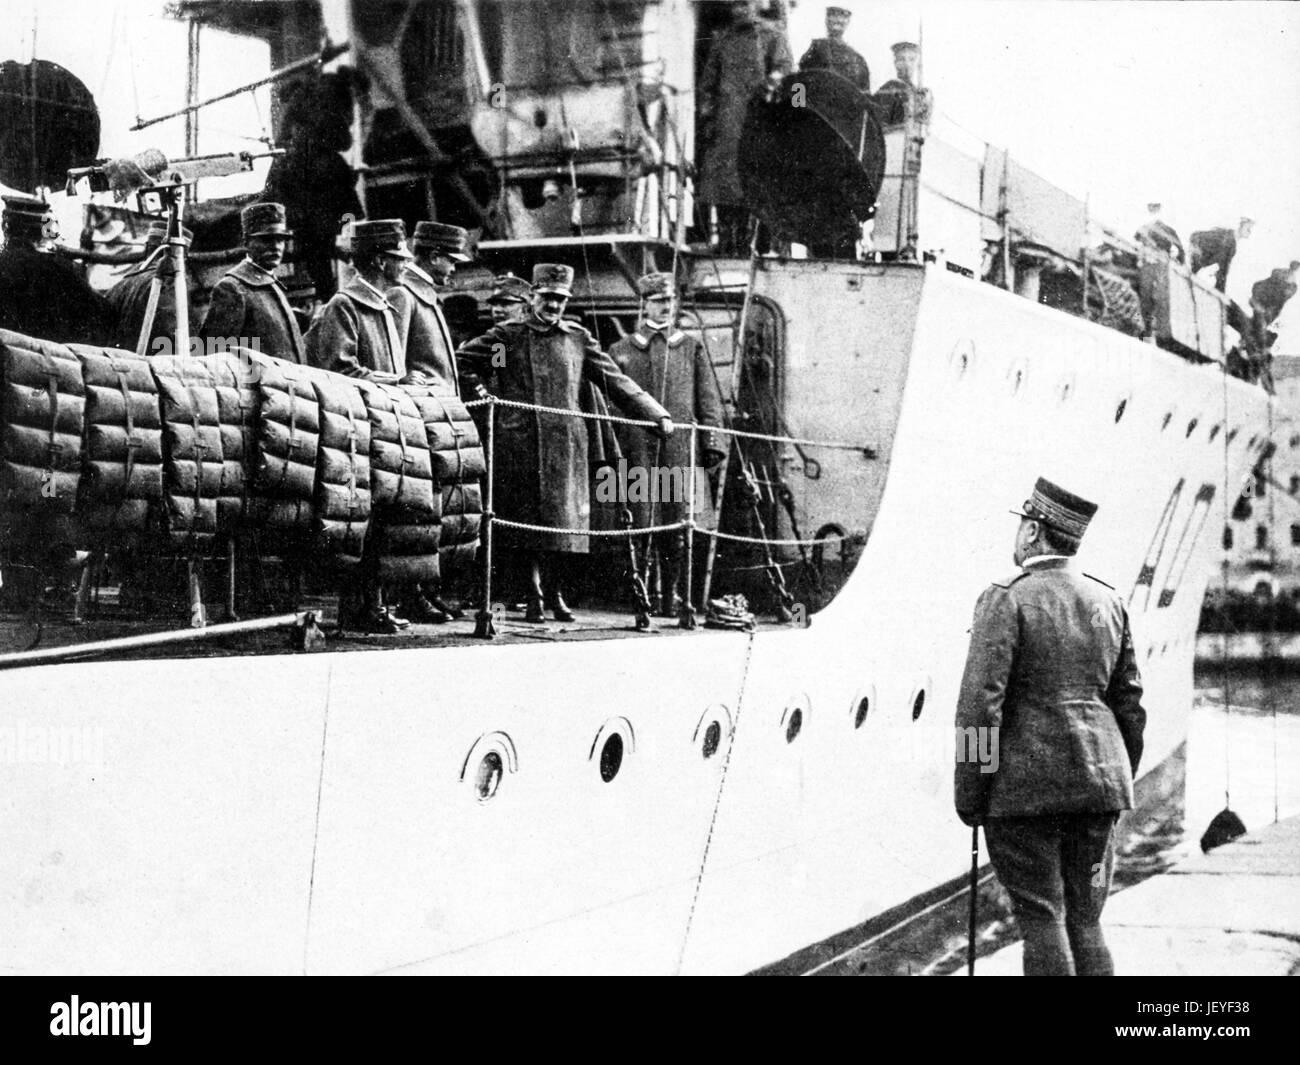 Carlo di roreto petitti, gobernador de Trieste, bienvenidos a Vittorio Emanuele III, Trieste 1918 Imagen De Stock